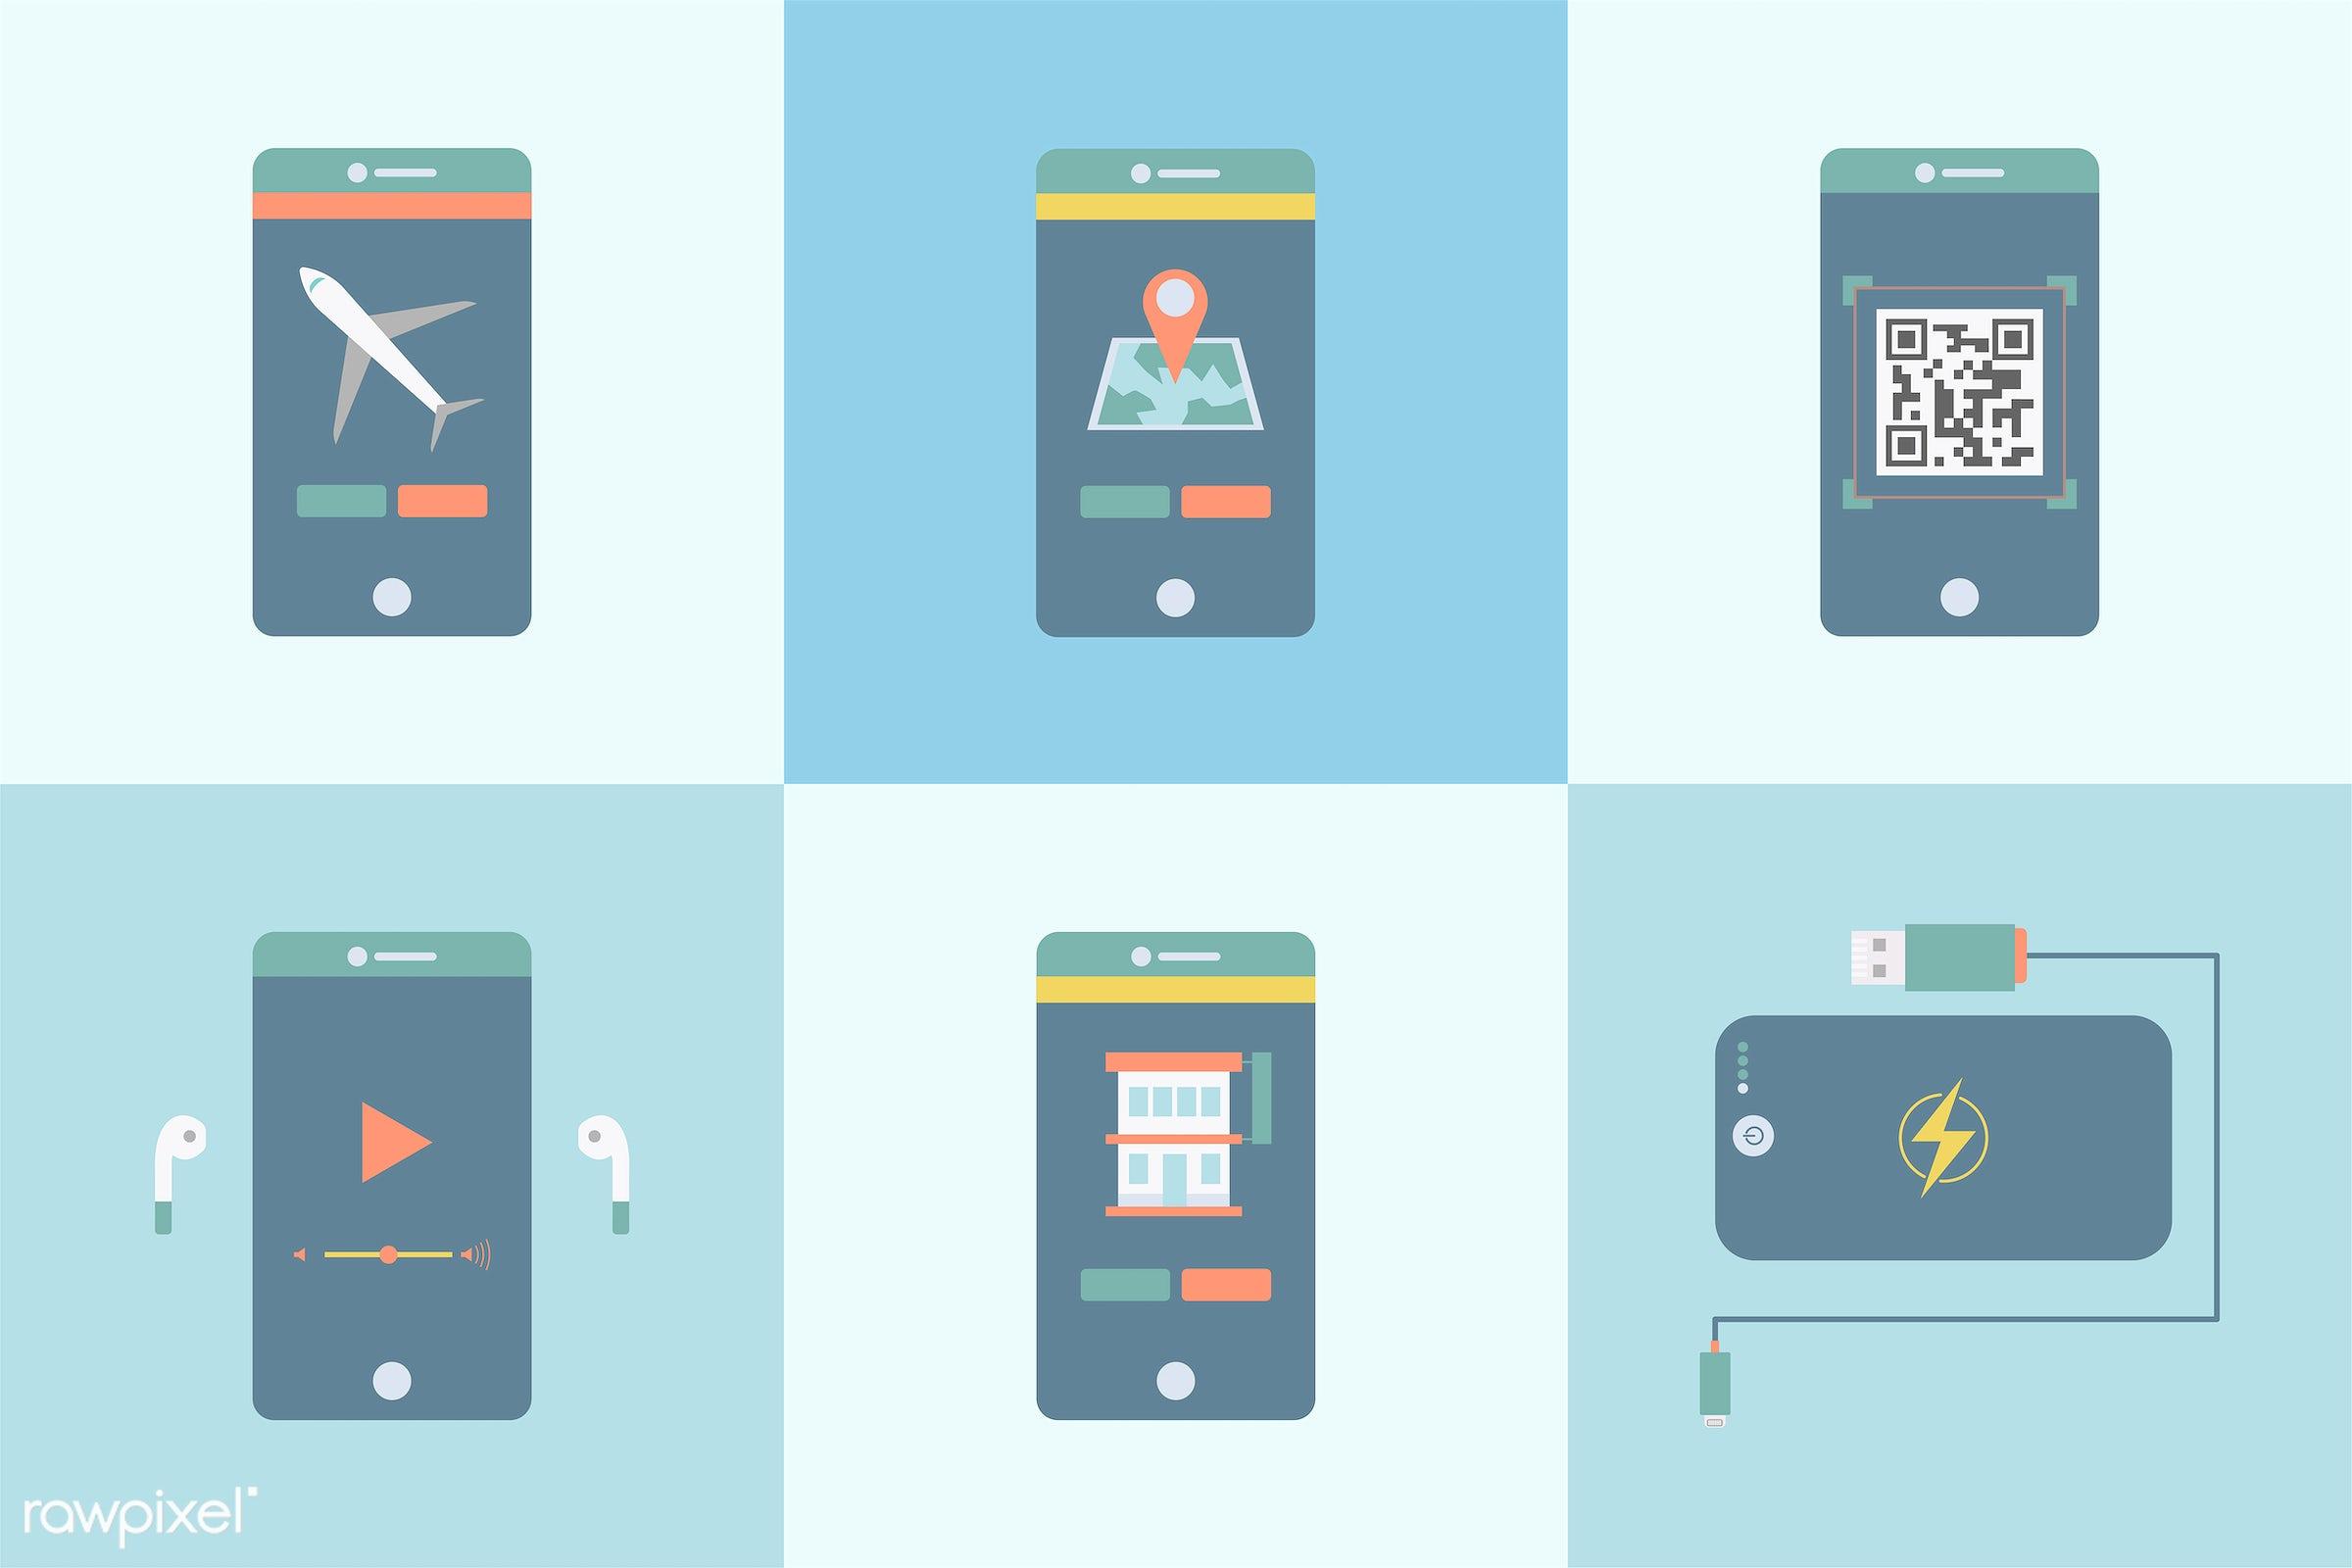 vector, illustration, graphic, collection, set, digital, digital device, phone, smartphone, tech, technology, social media,...